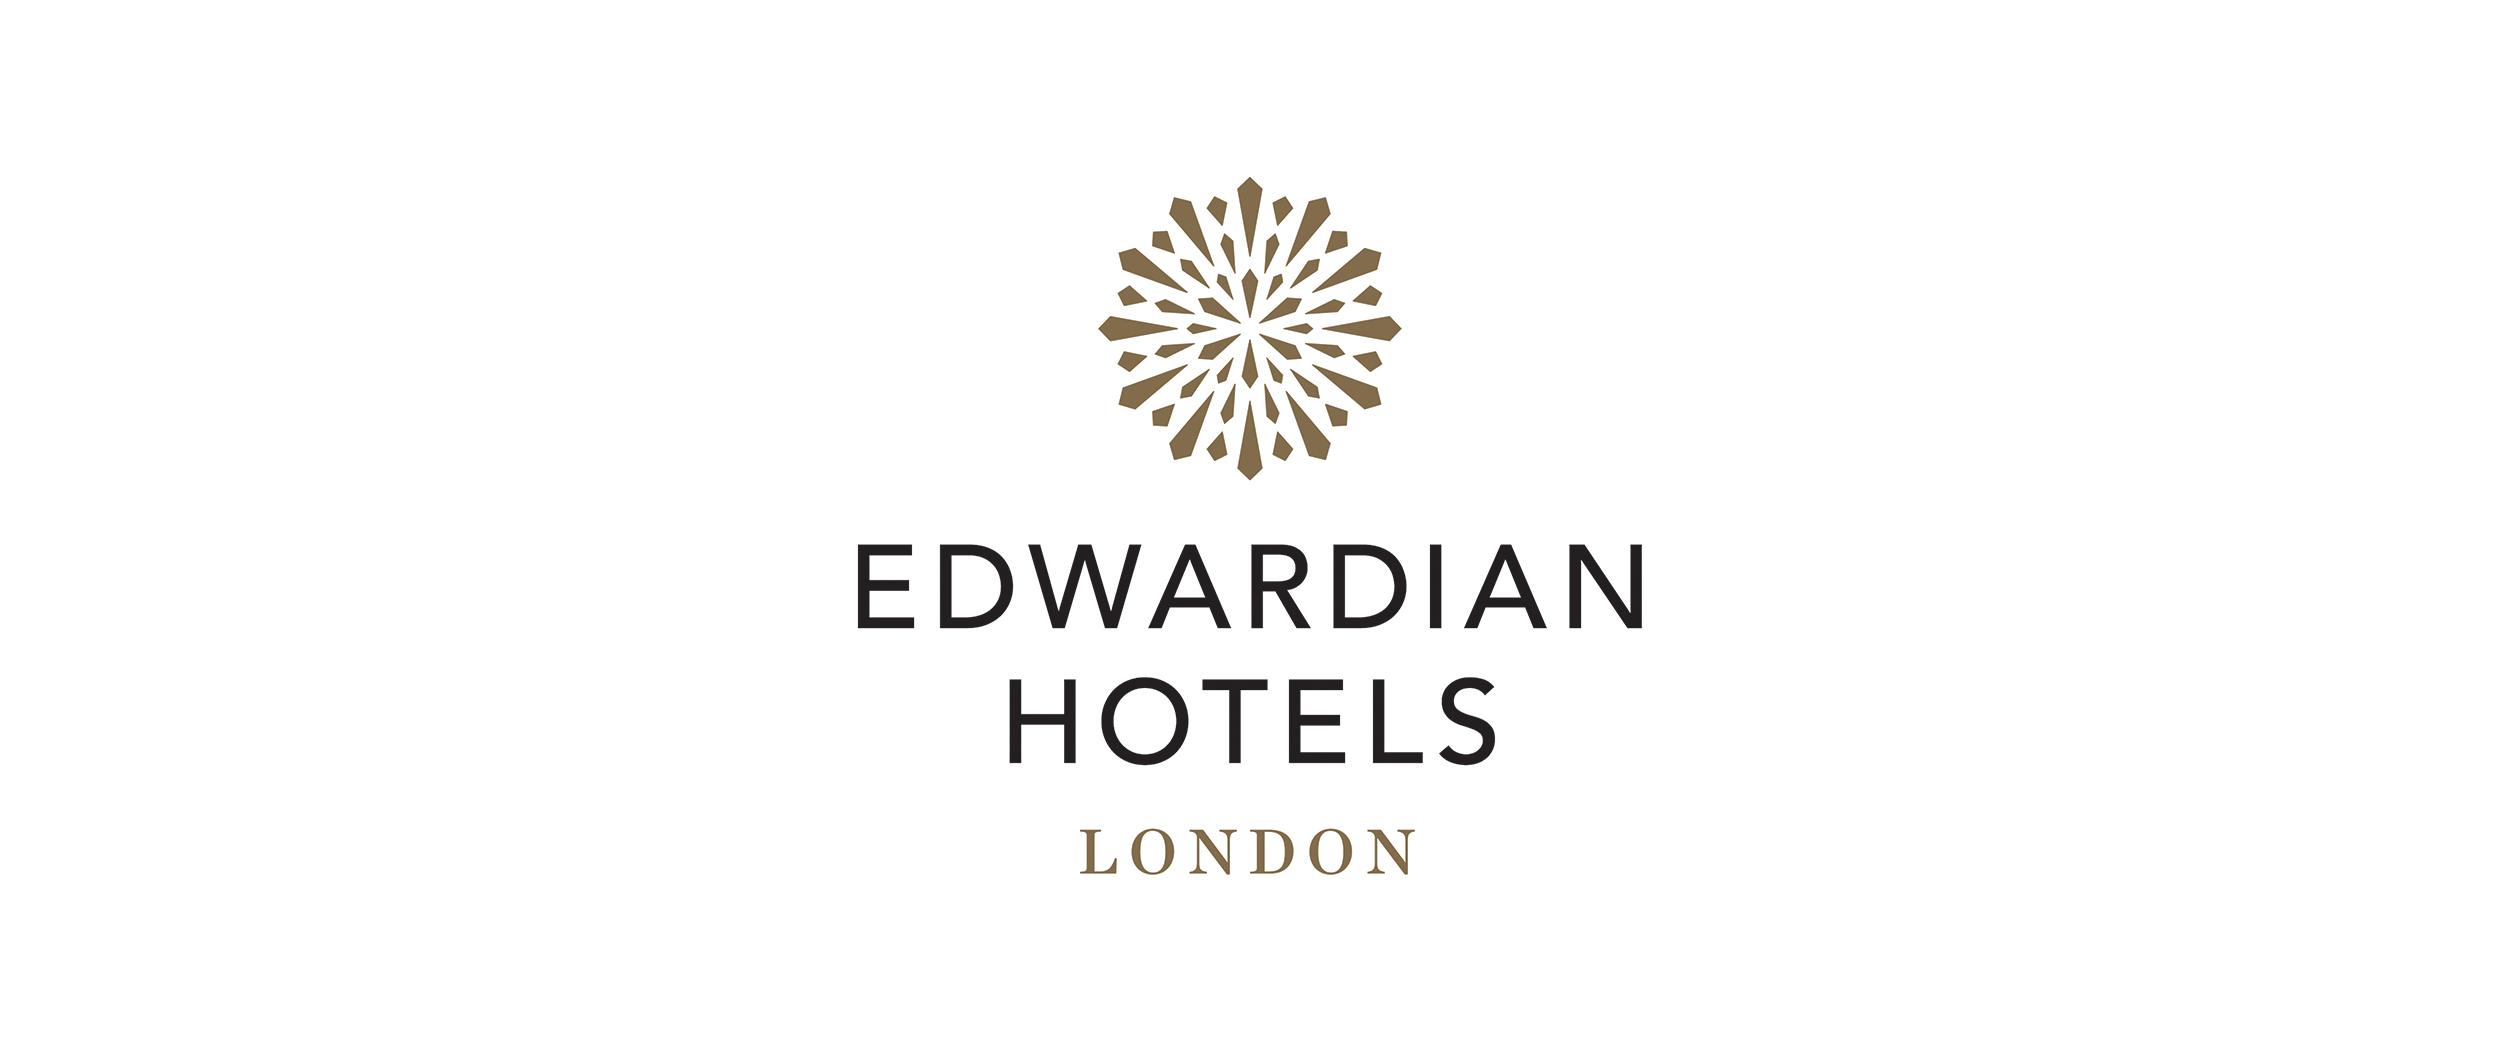 Edwardian Hotels London